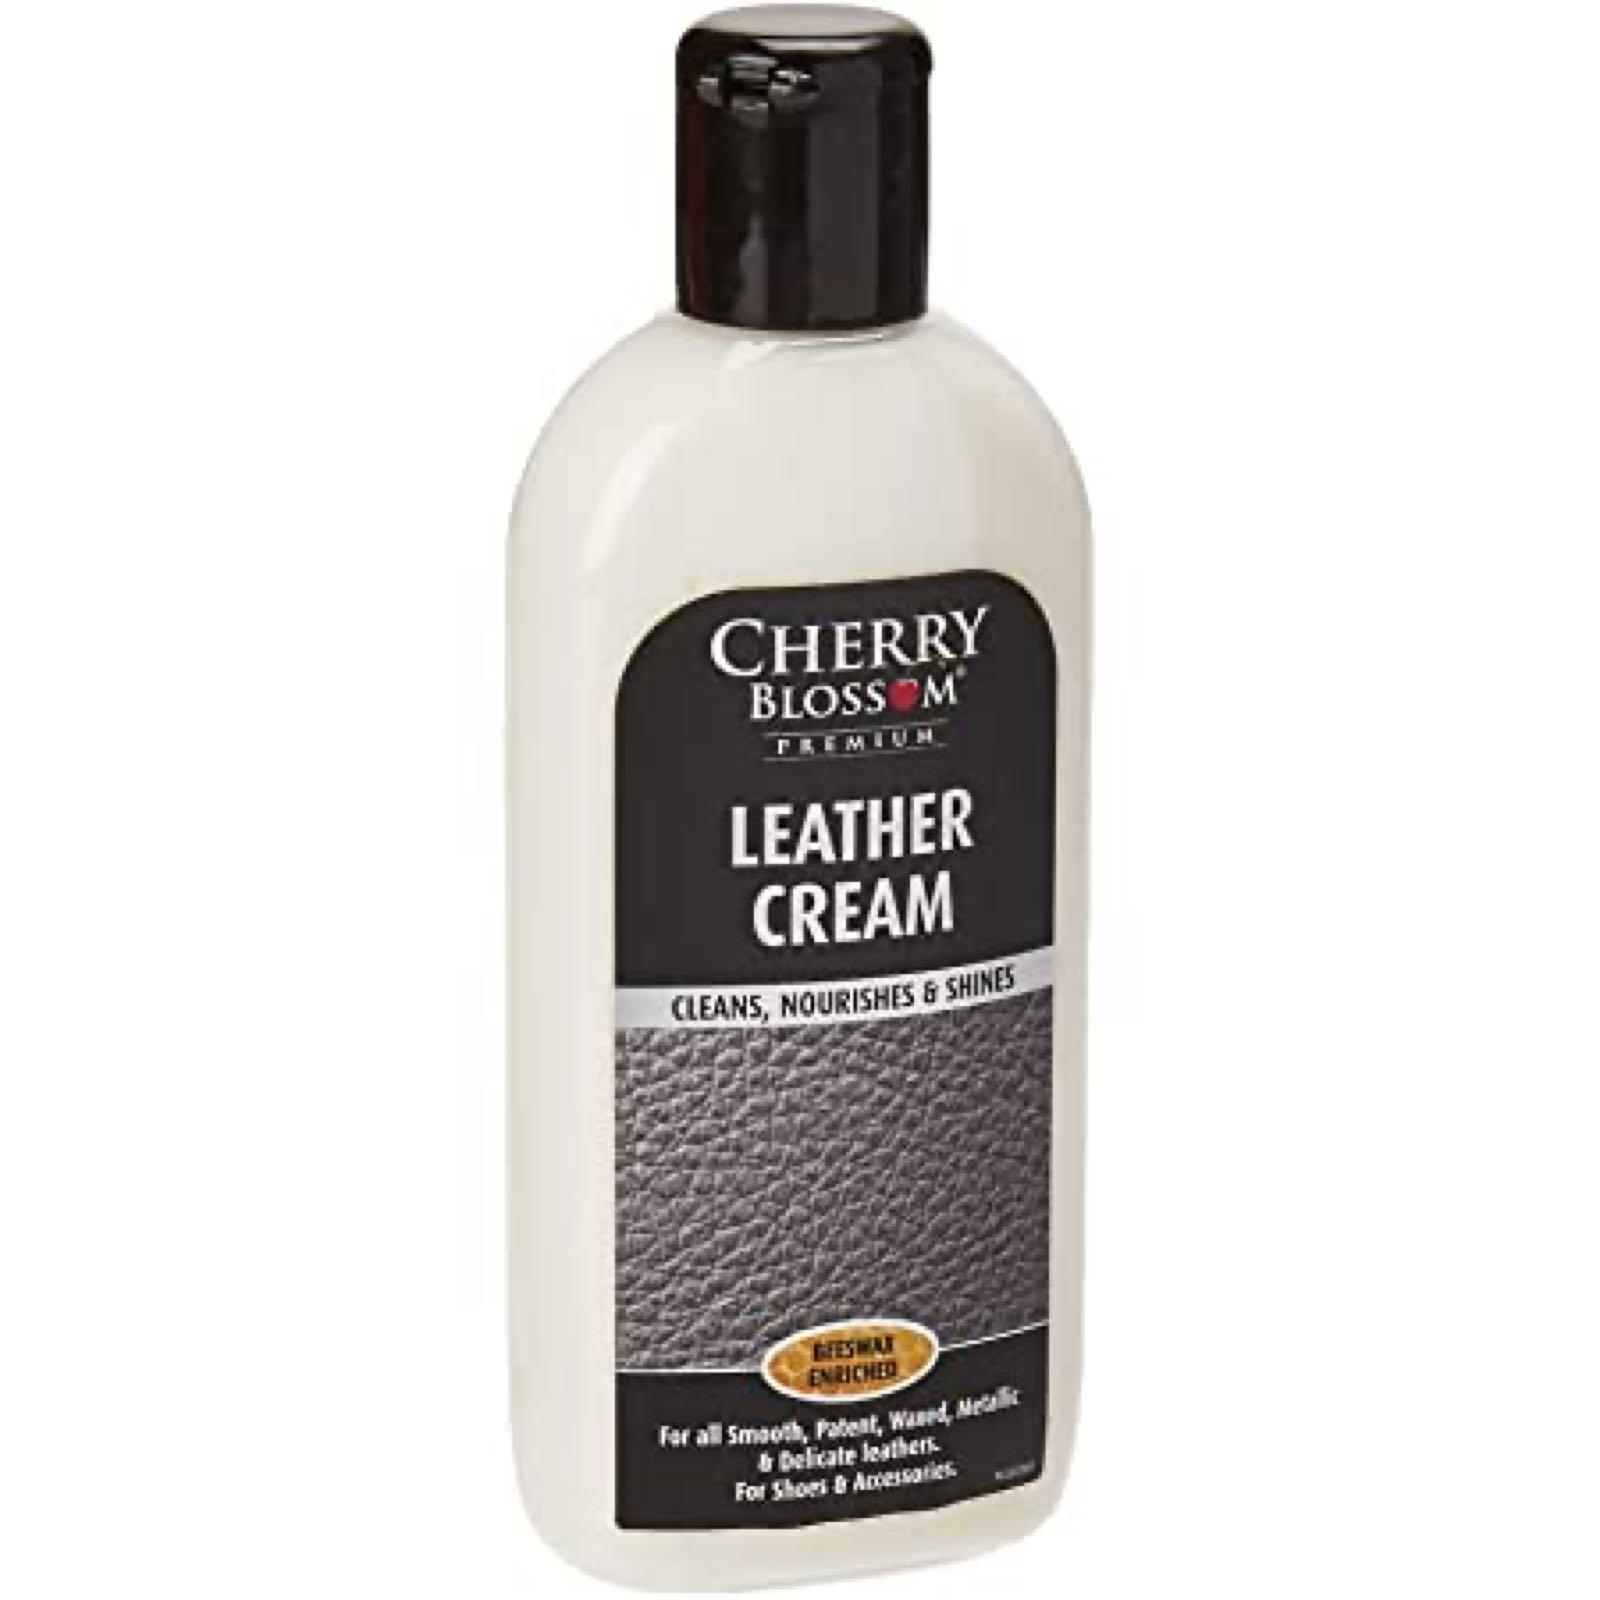 Cherry Blossom Leather Cream